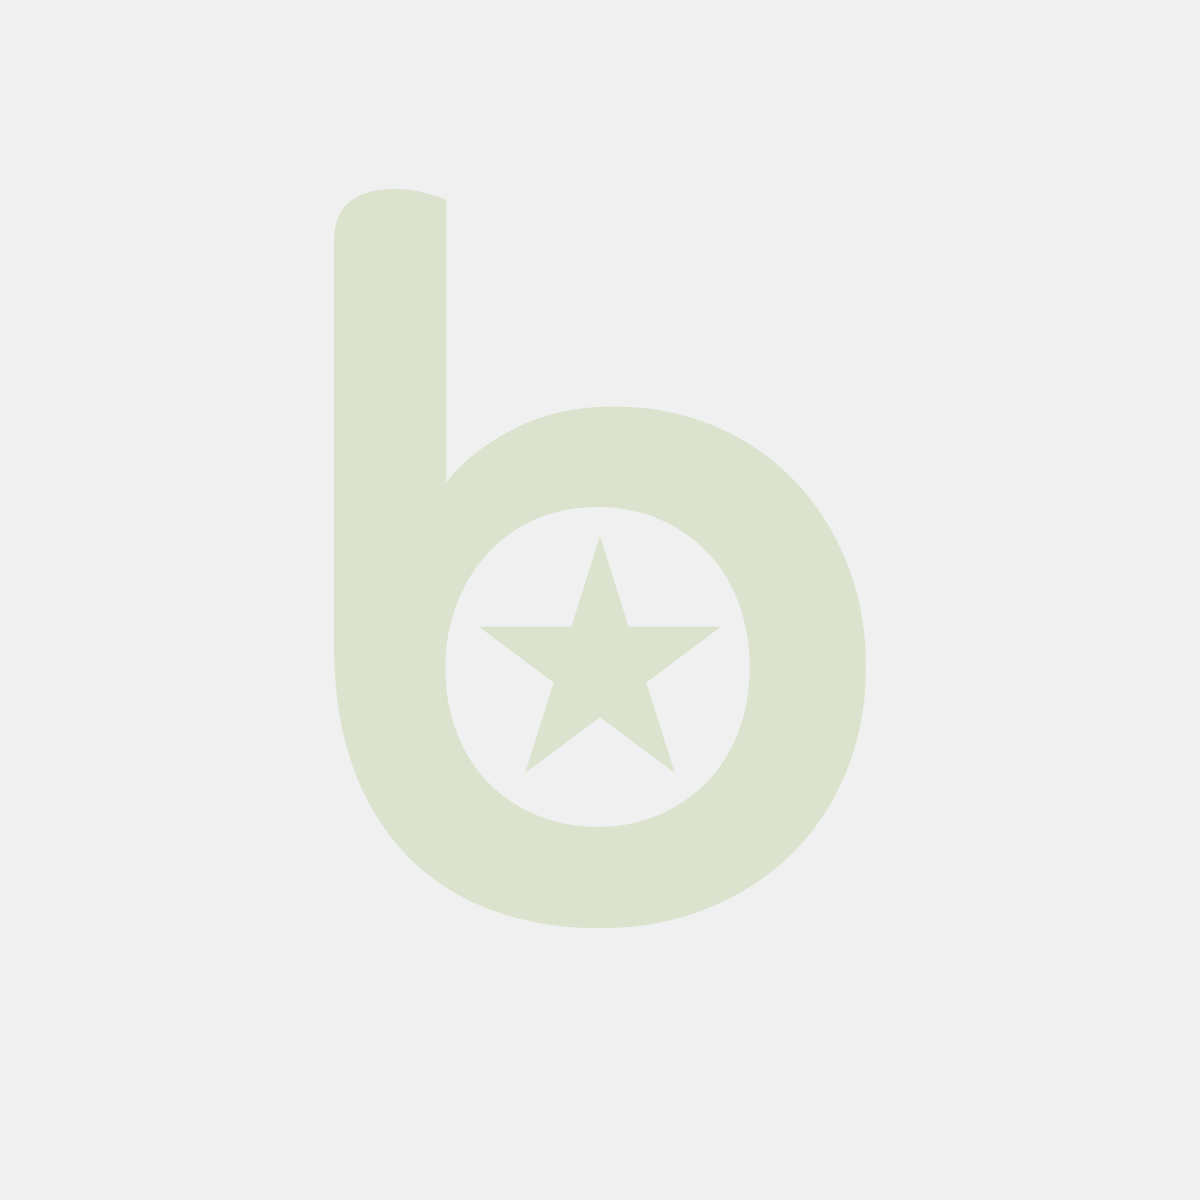 Schładzarka szokowa 10XGN 1/1 - kod 232187